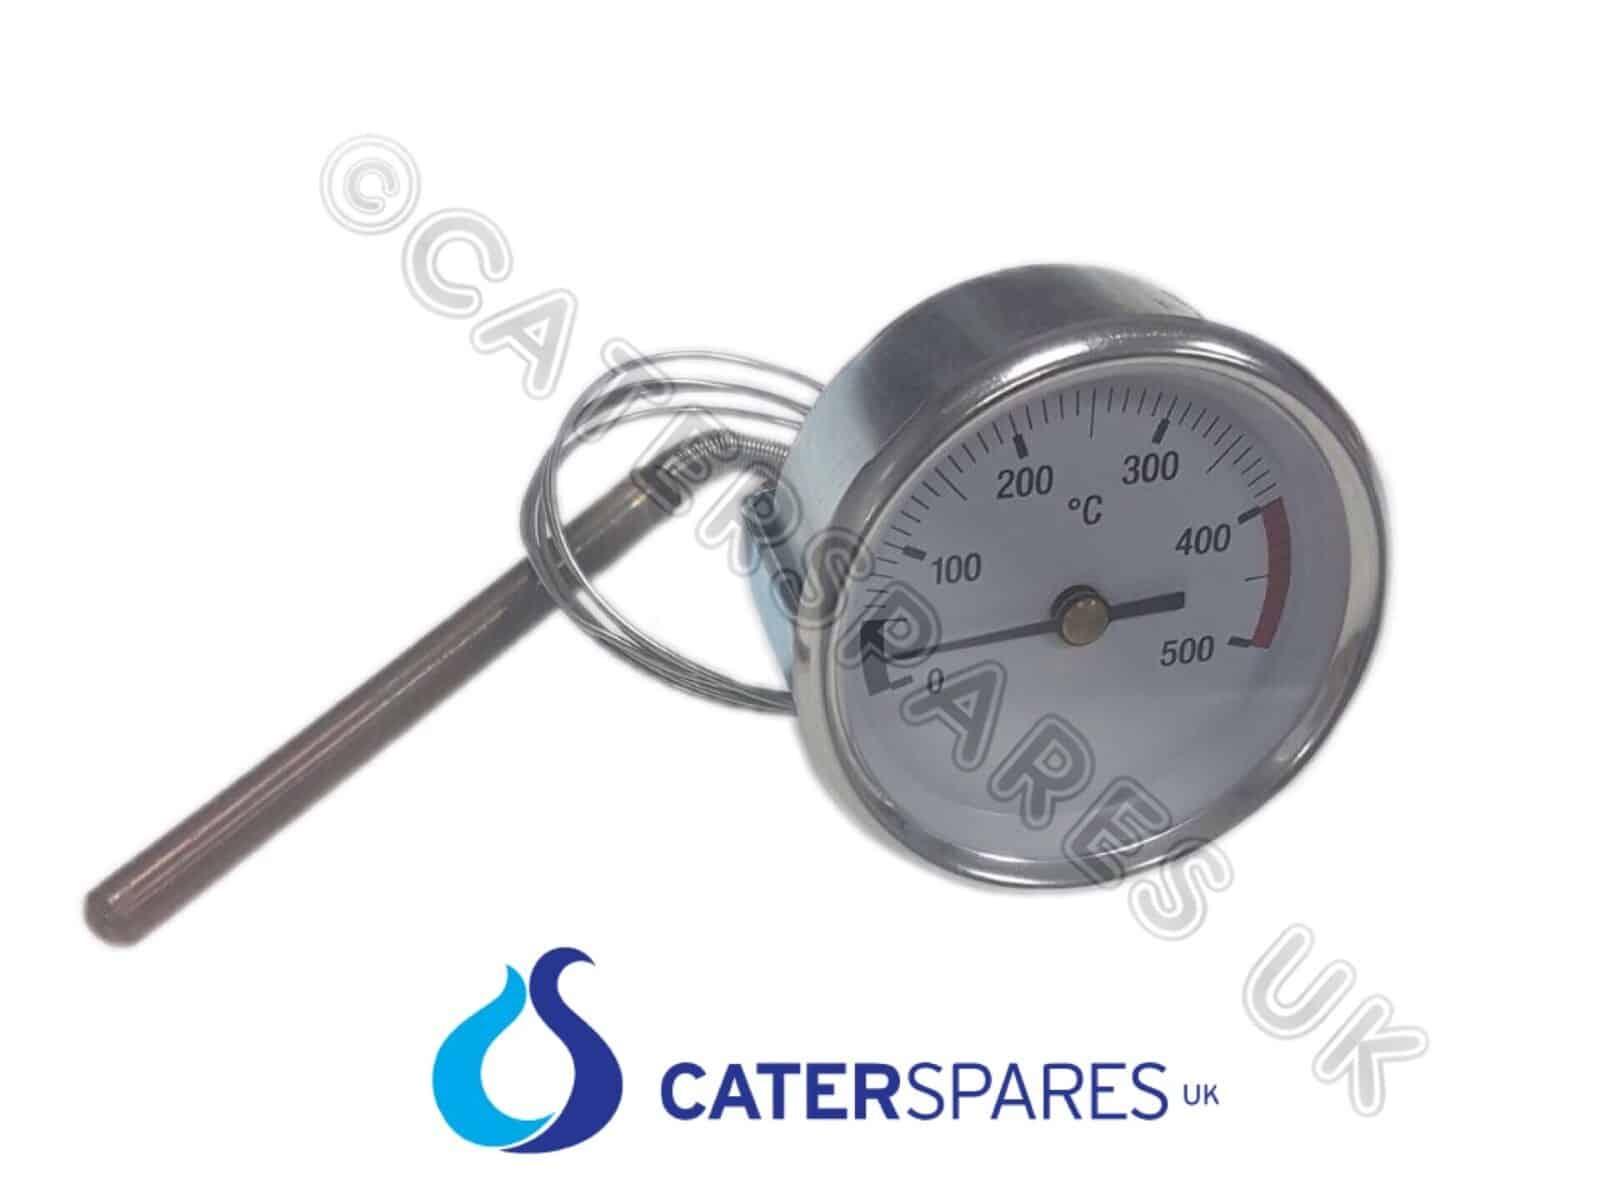 Universal Pizza Oven Thermometer Temperature Display Clock 60mm Diameter 0 500oc Catersparesuk